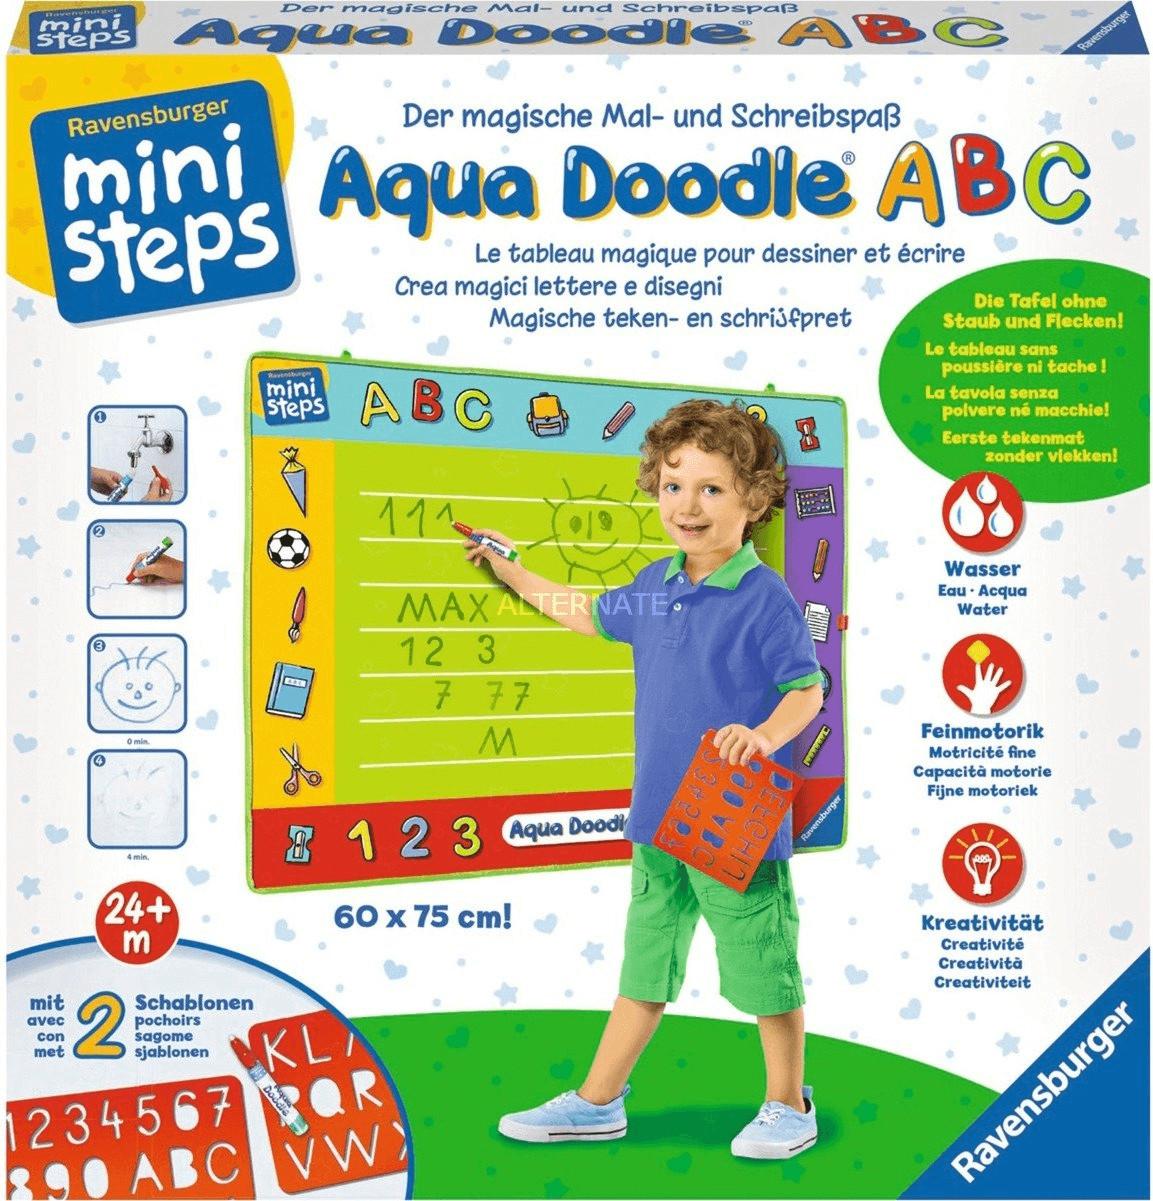 Ravensburger Aqua Doodle ministeps ABC